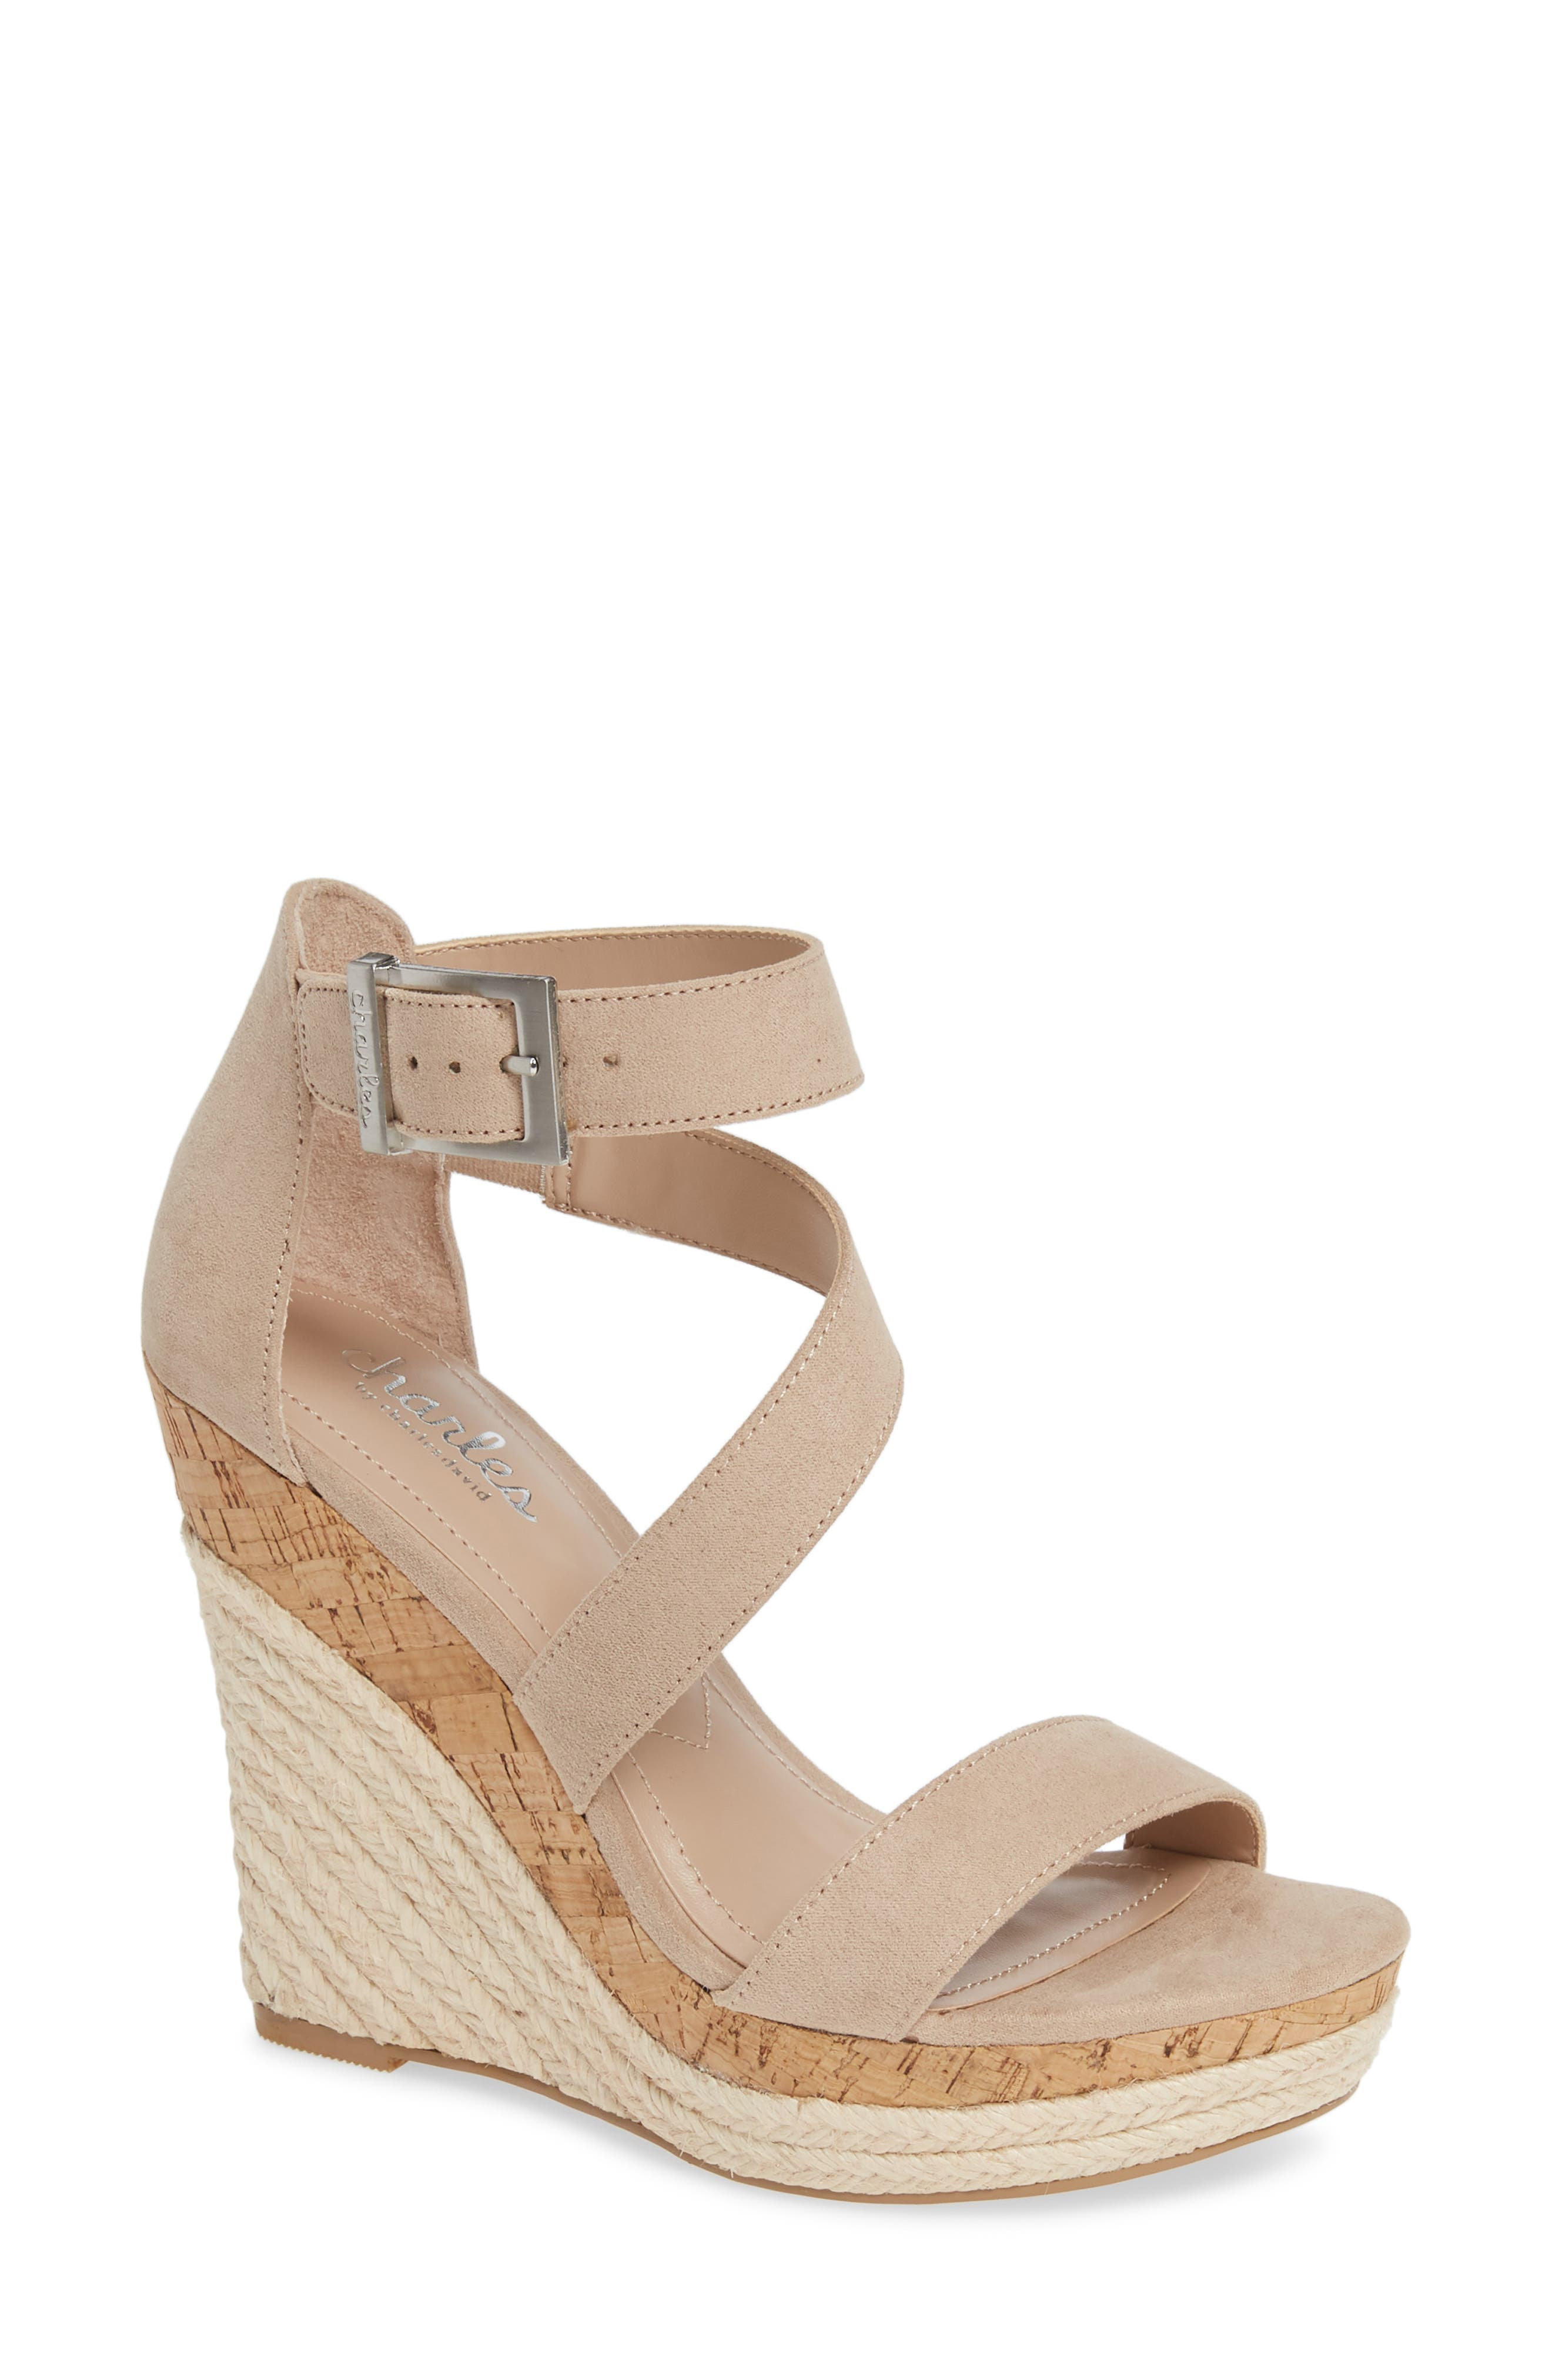 Adrielle Asymmetrical Platform Wedge Sandal in Nude Fabric